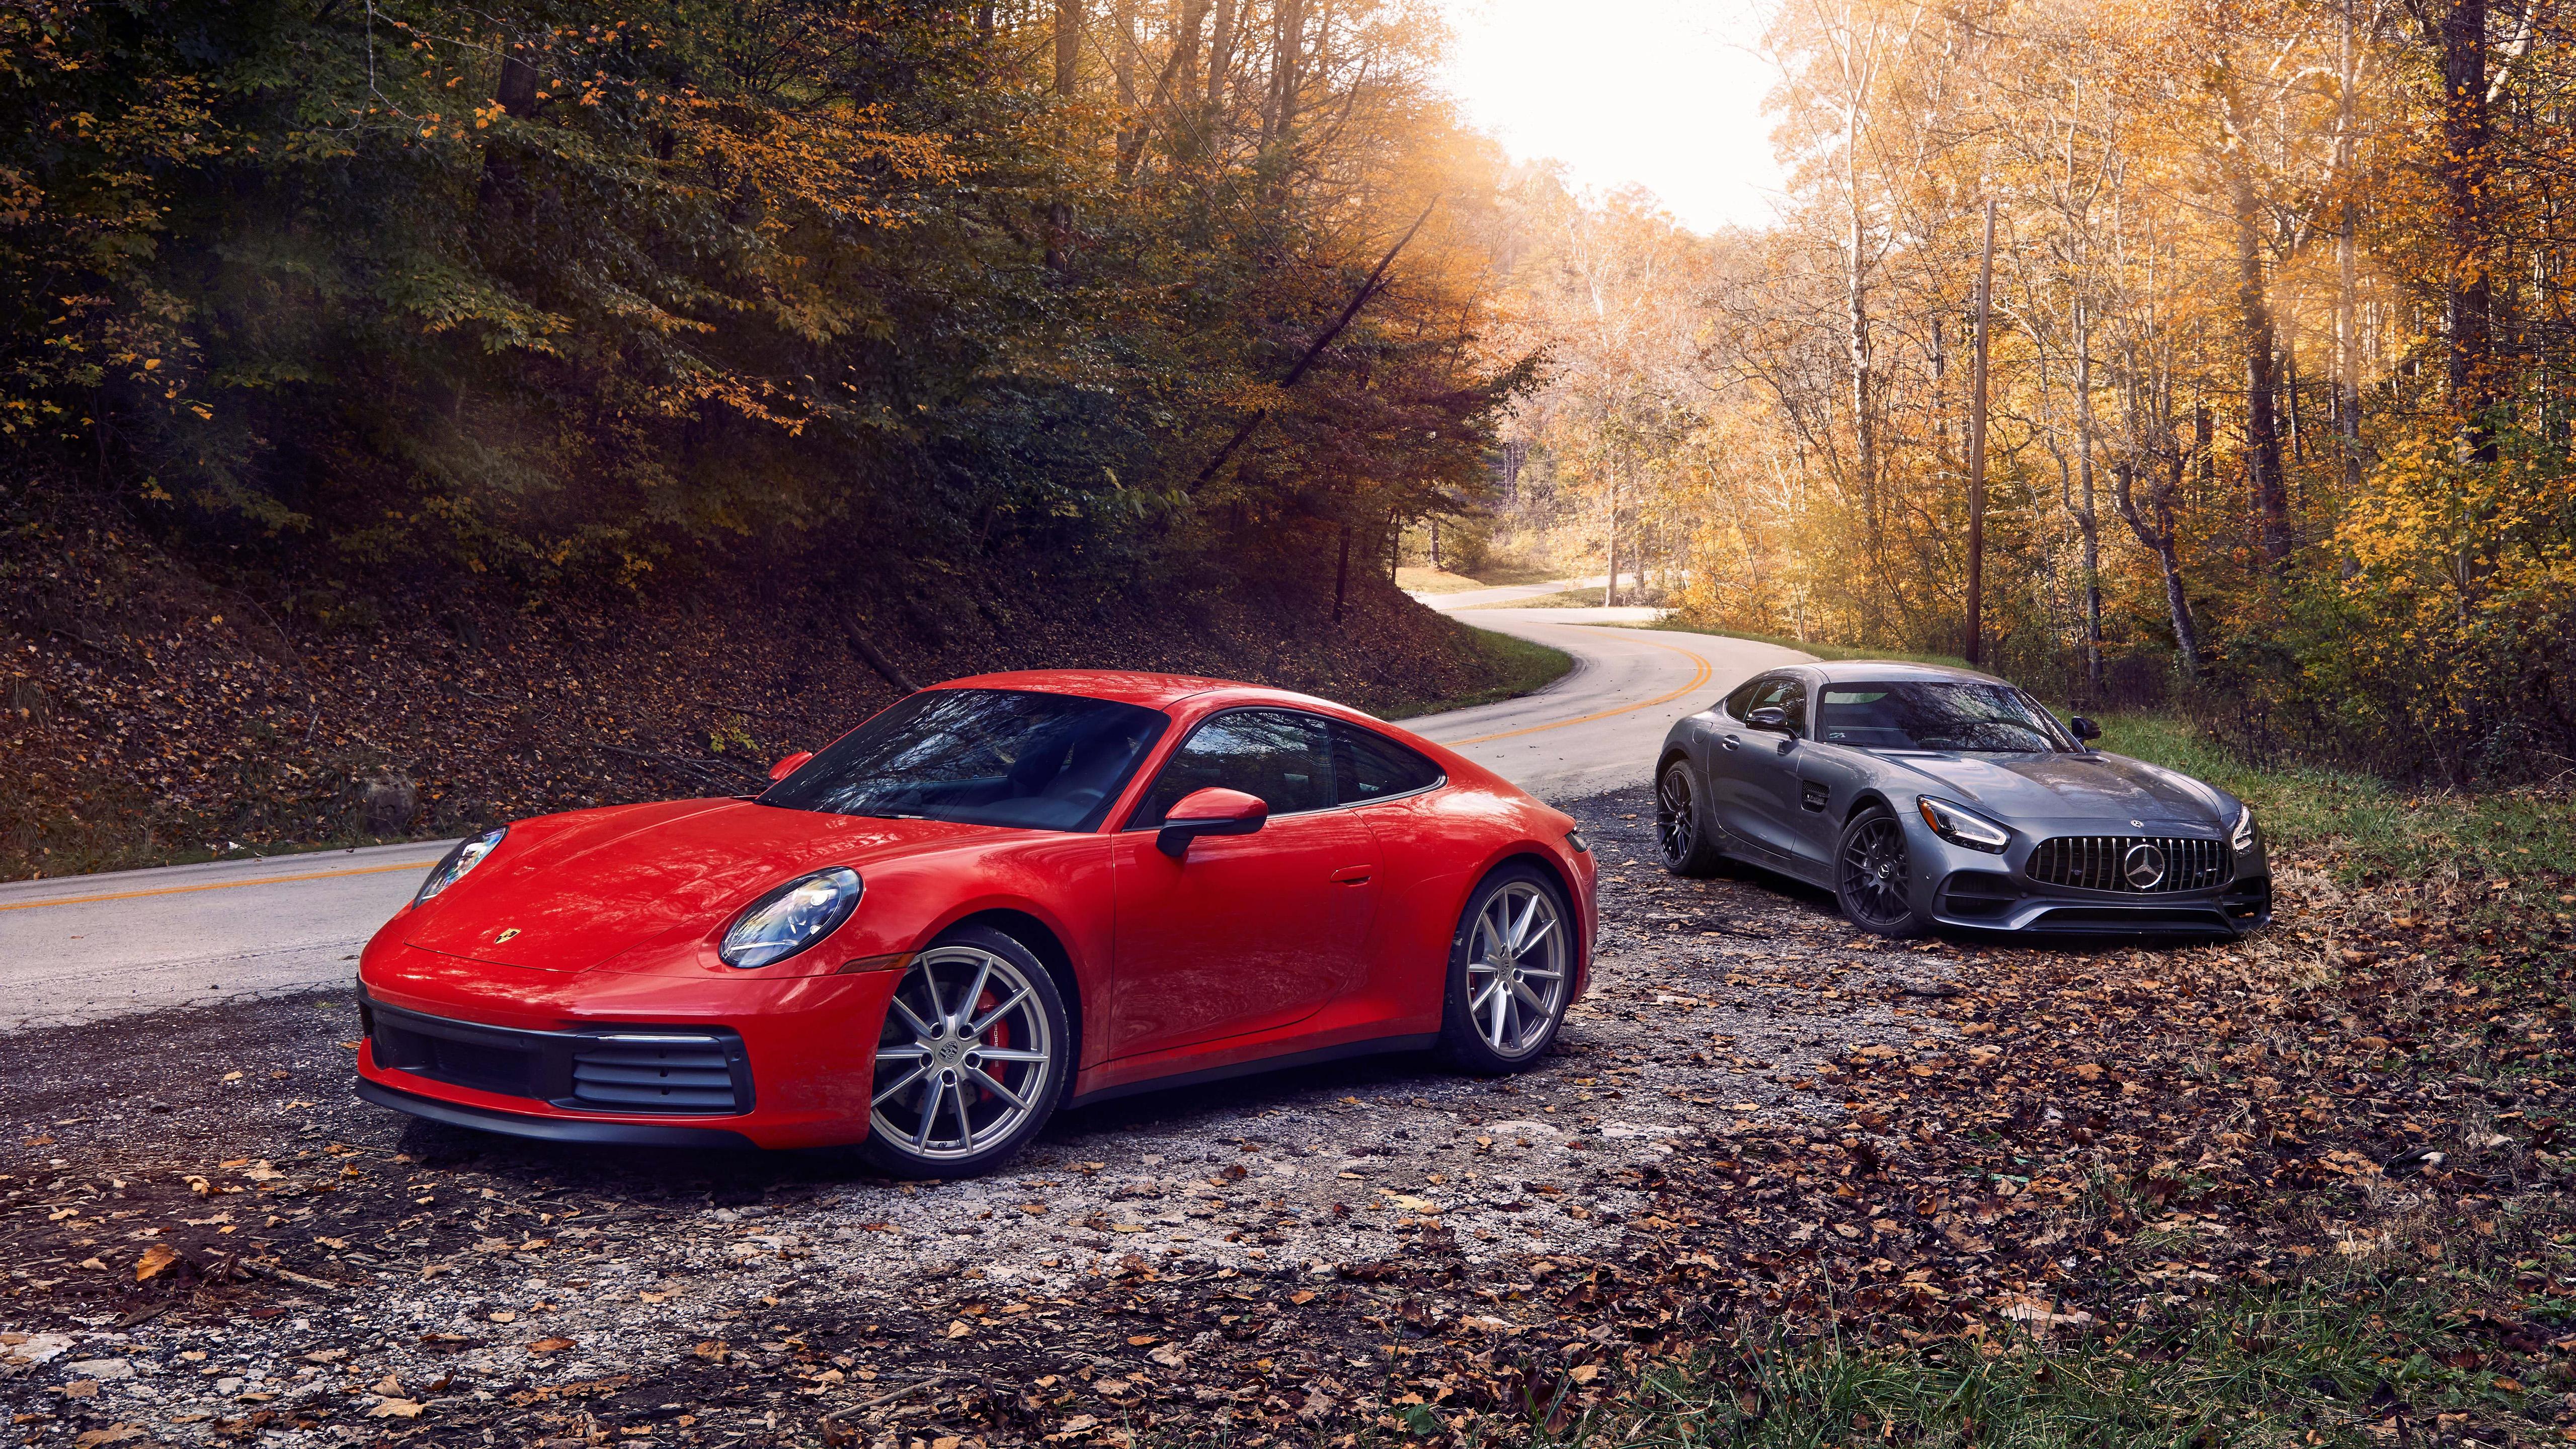 2020 Mercedes Amg Gt 2020 Porsche 911 Carrera S 5k Retina Ultra Hd Wallpaper Background Image 5120x2880 Id 1059453 Wallpaper Abyss